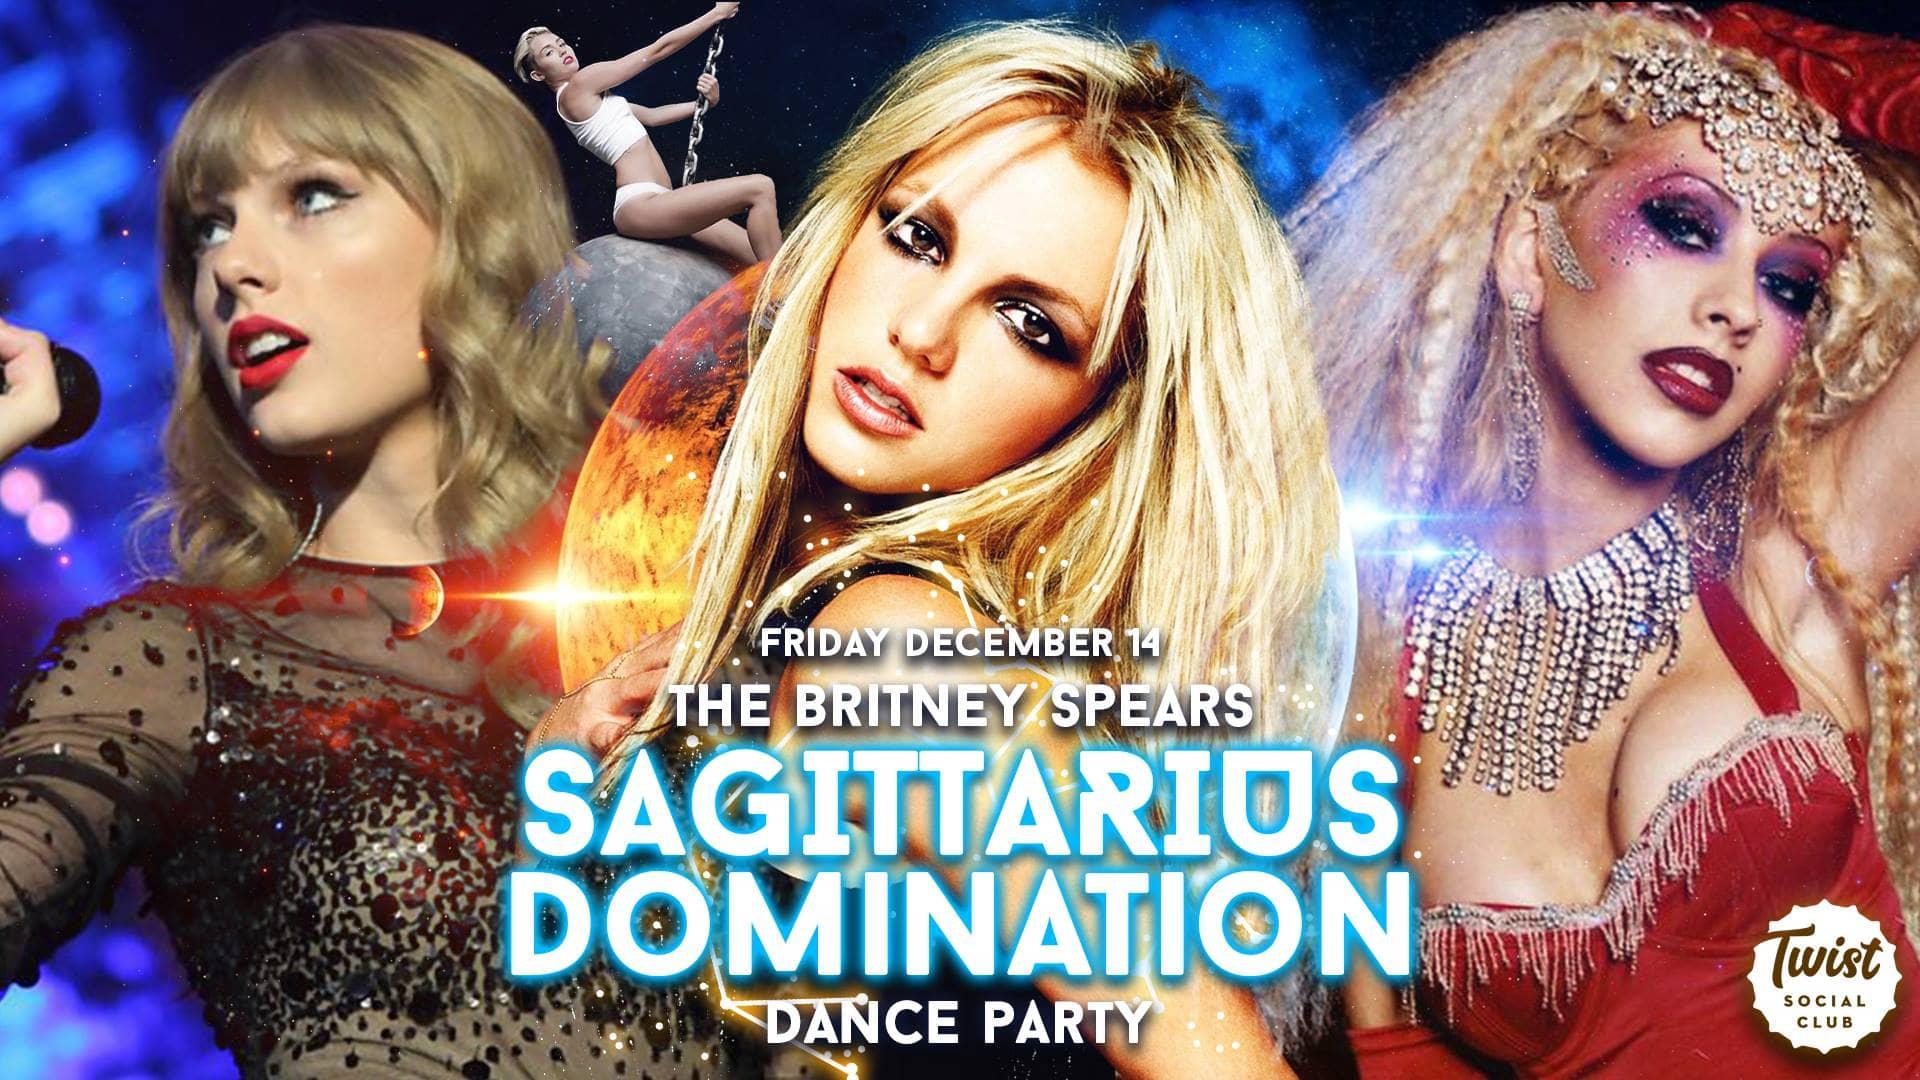 Britney Spears Sagittarius Domination Dance Party